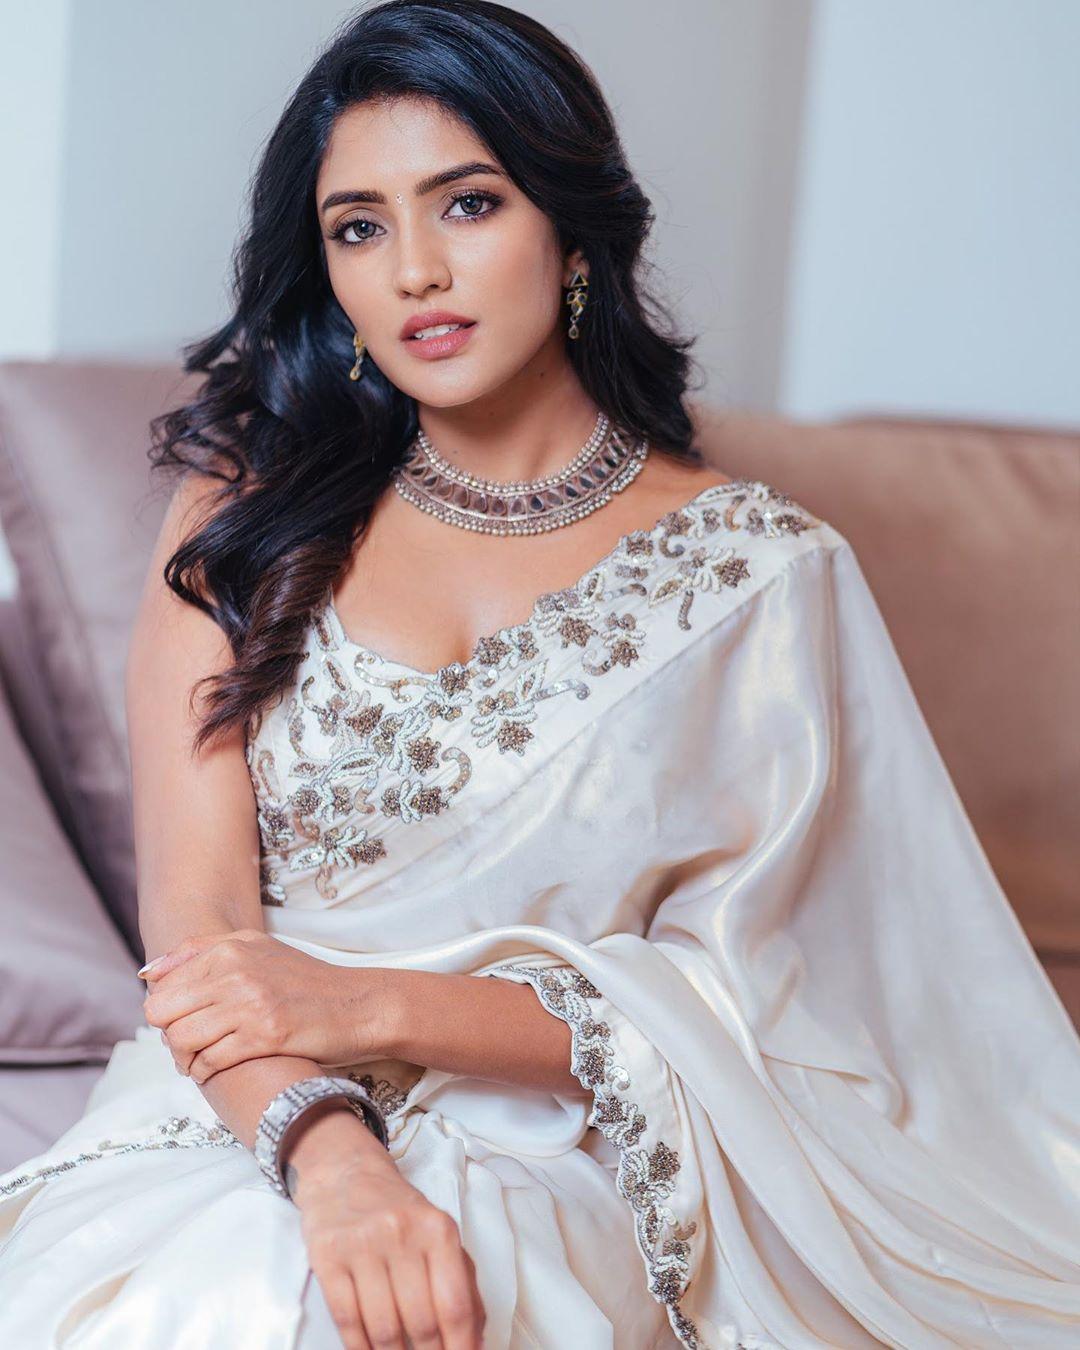 Actress Eesha Rebba Beautiful Exclusive White Saree Pics